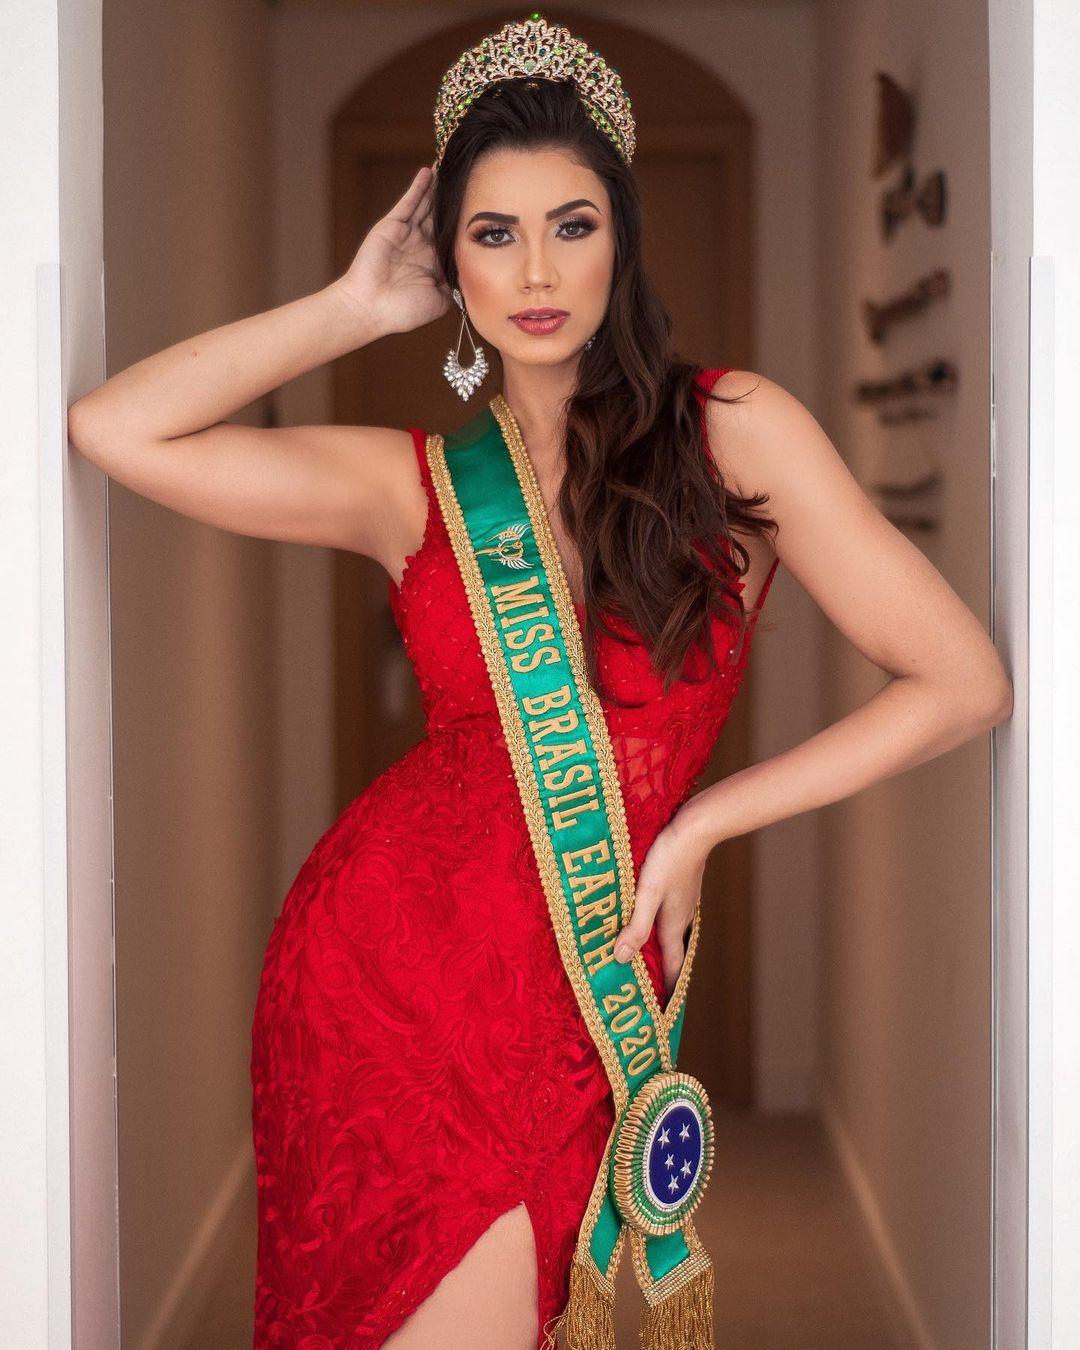 thais bergamini, miss terra brasil 2020. Thaisb10